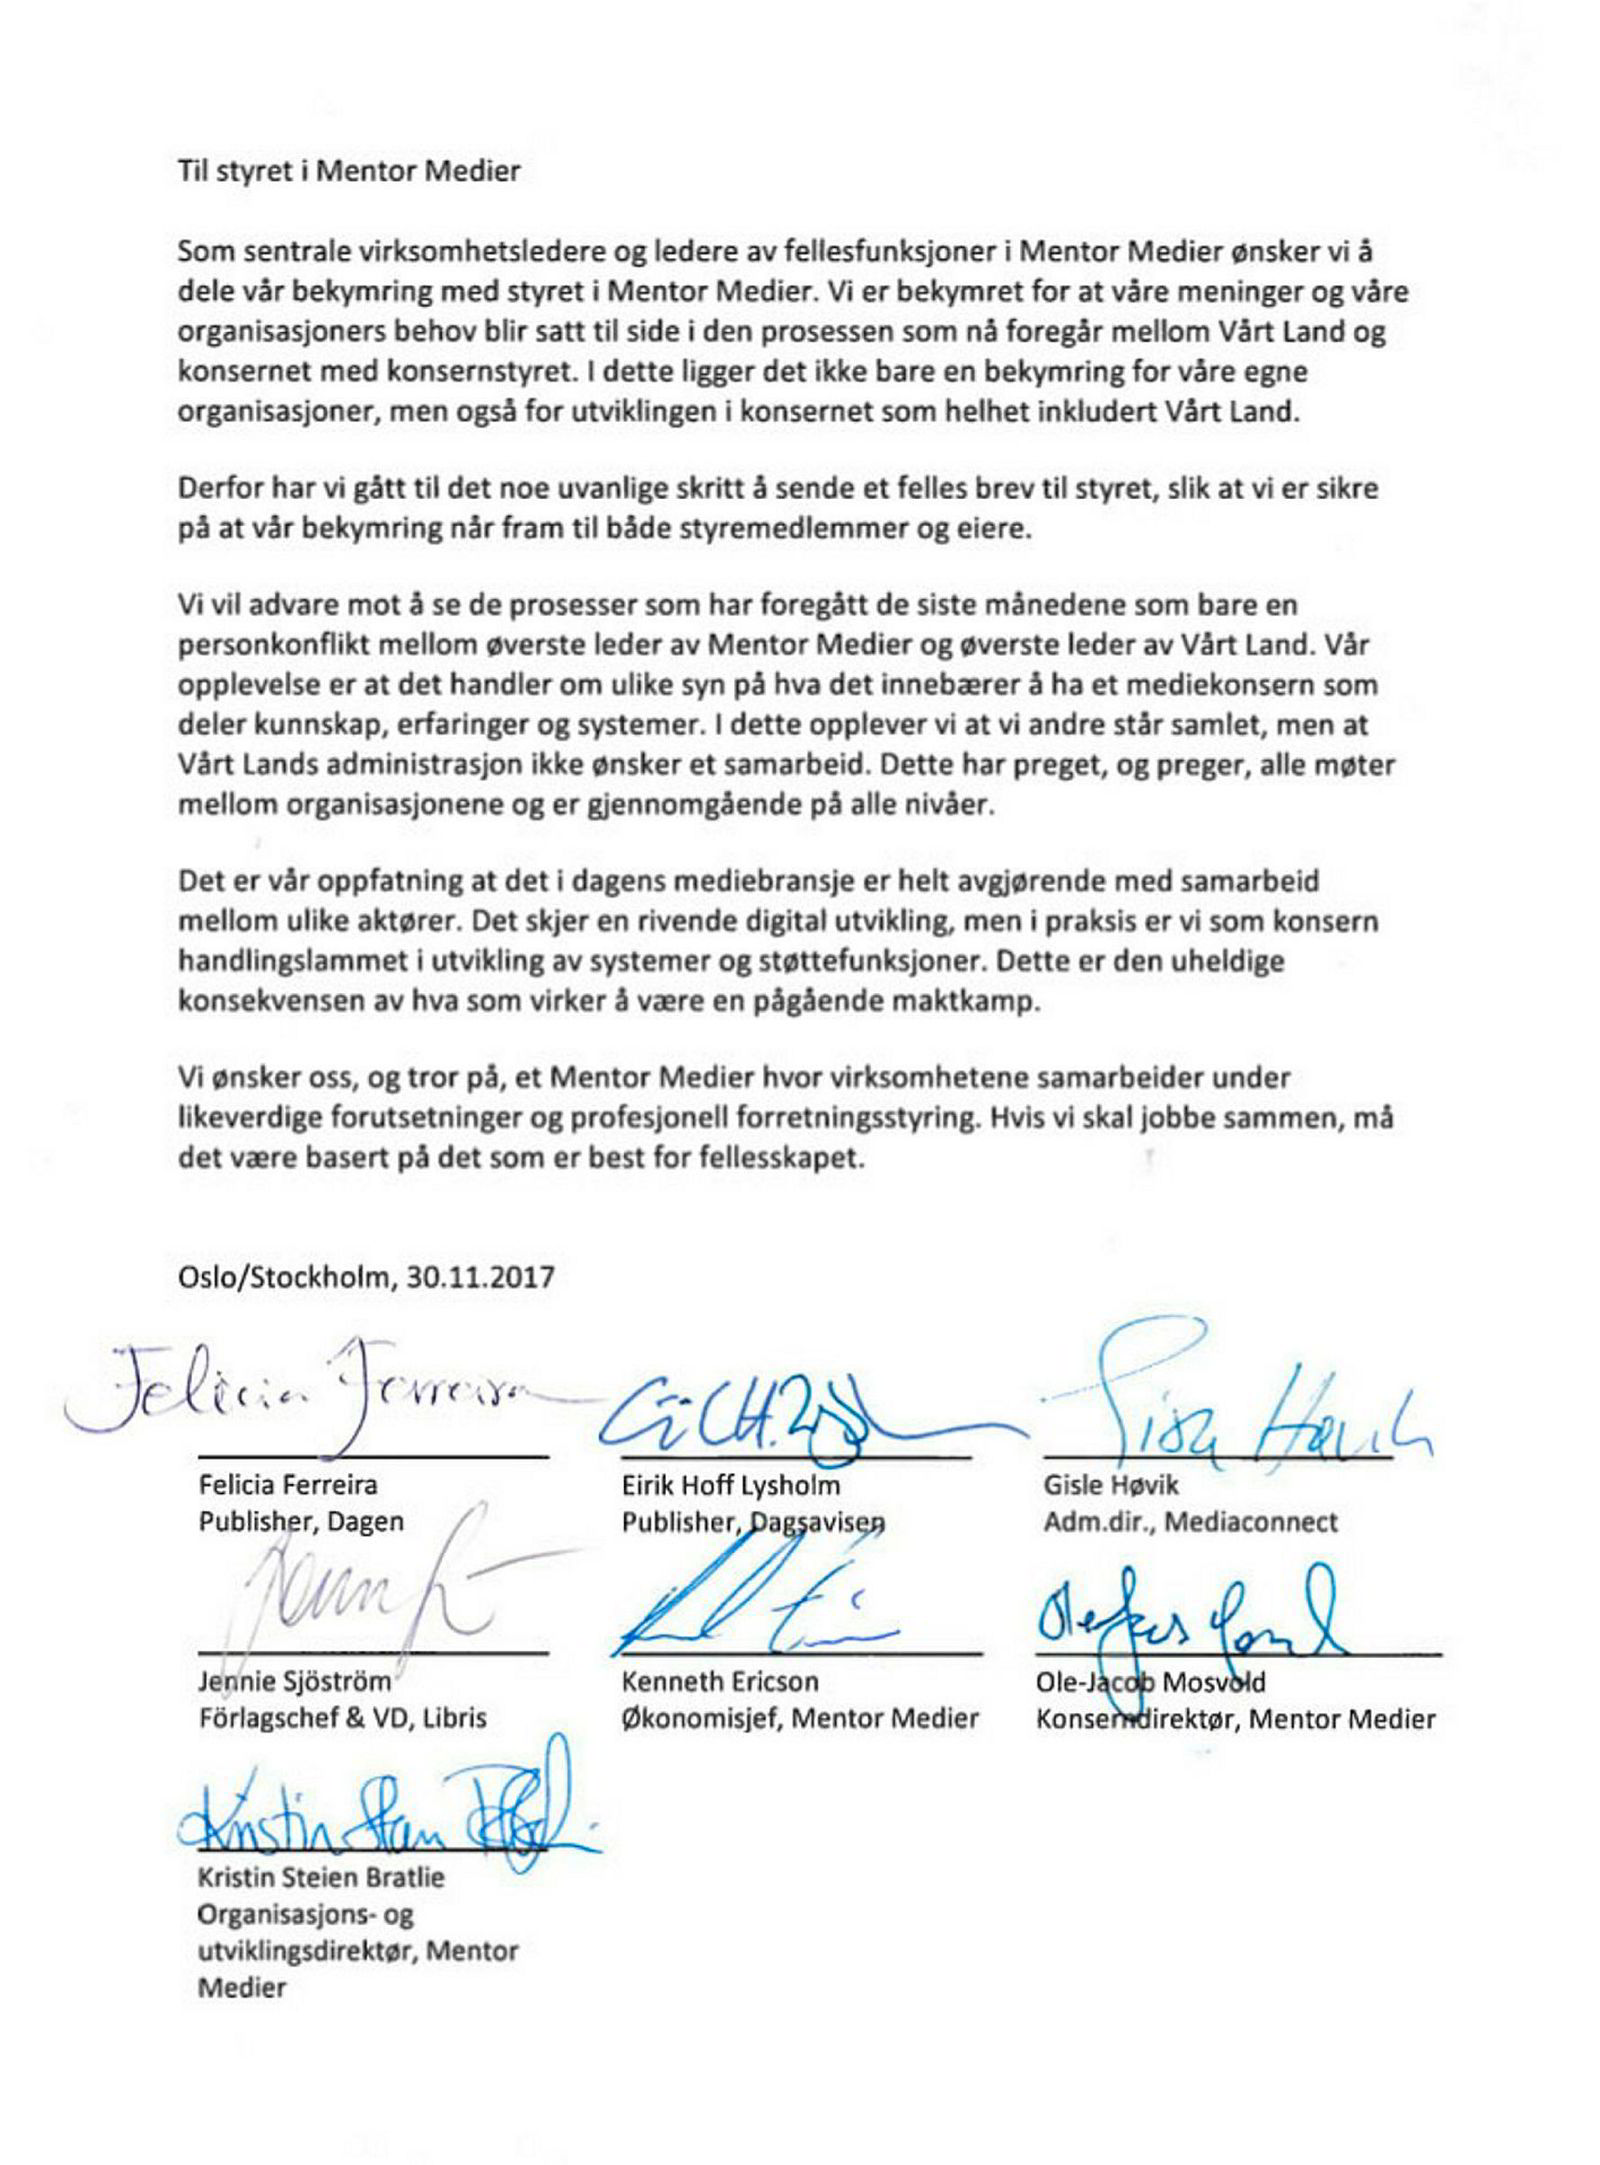 Vårt Land internt signert brev. ---